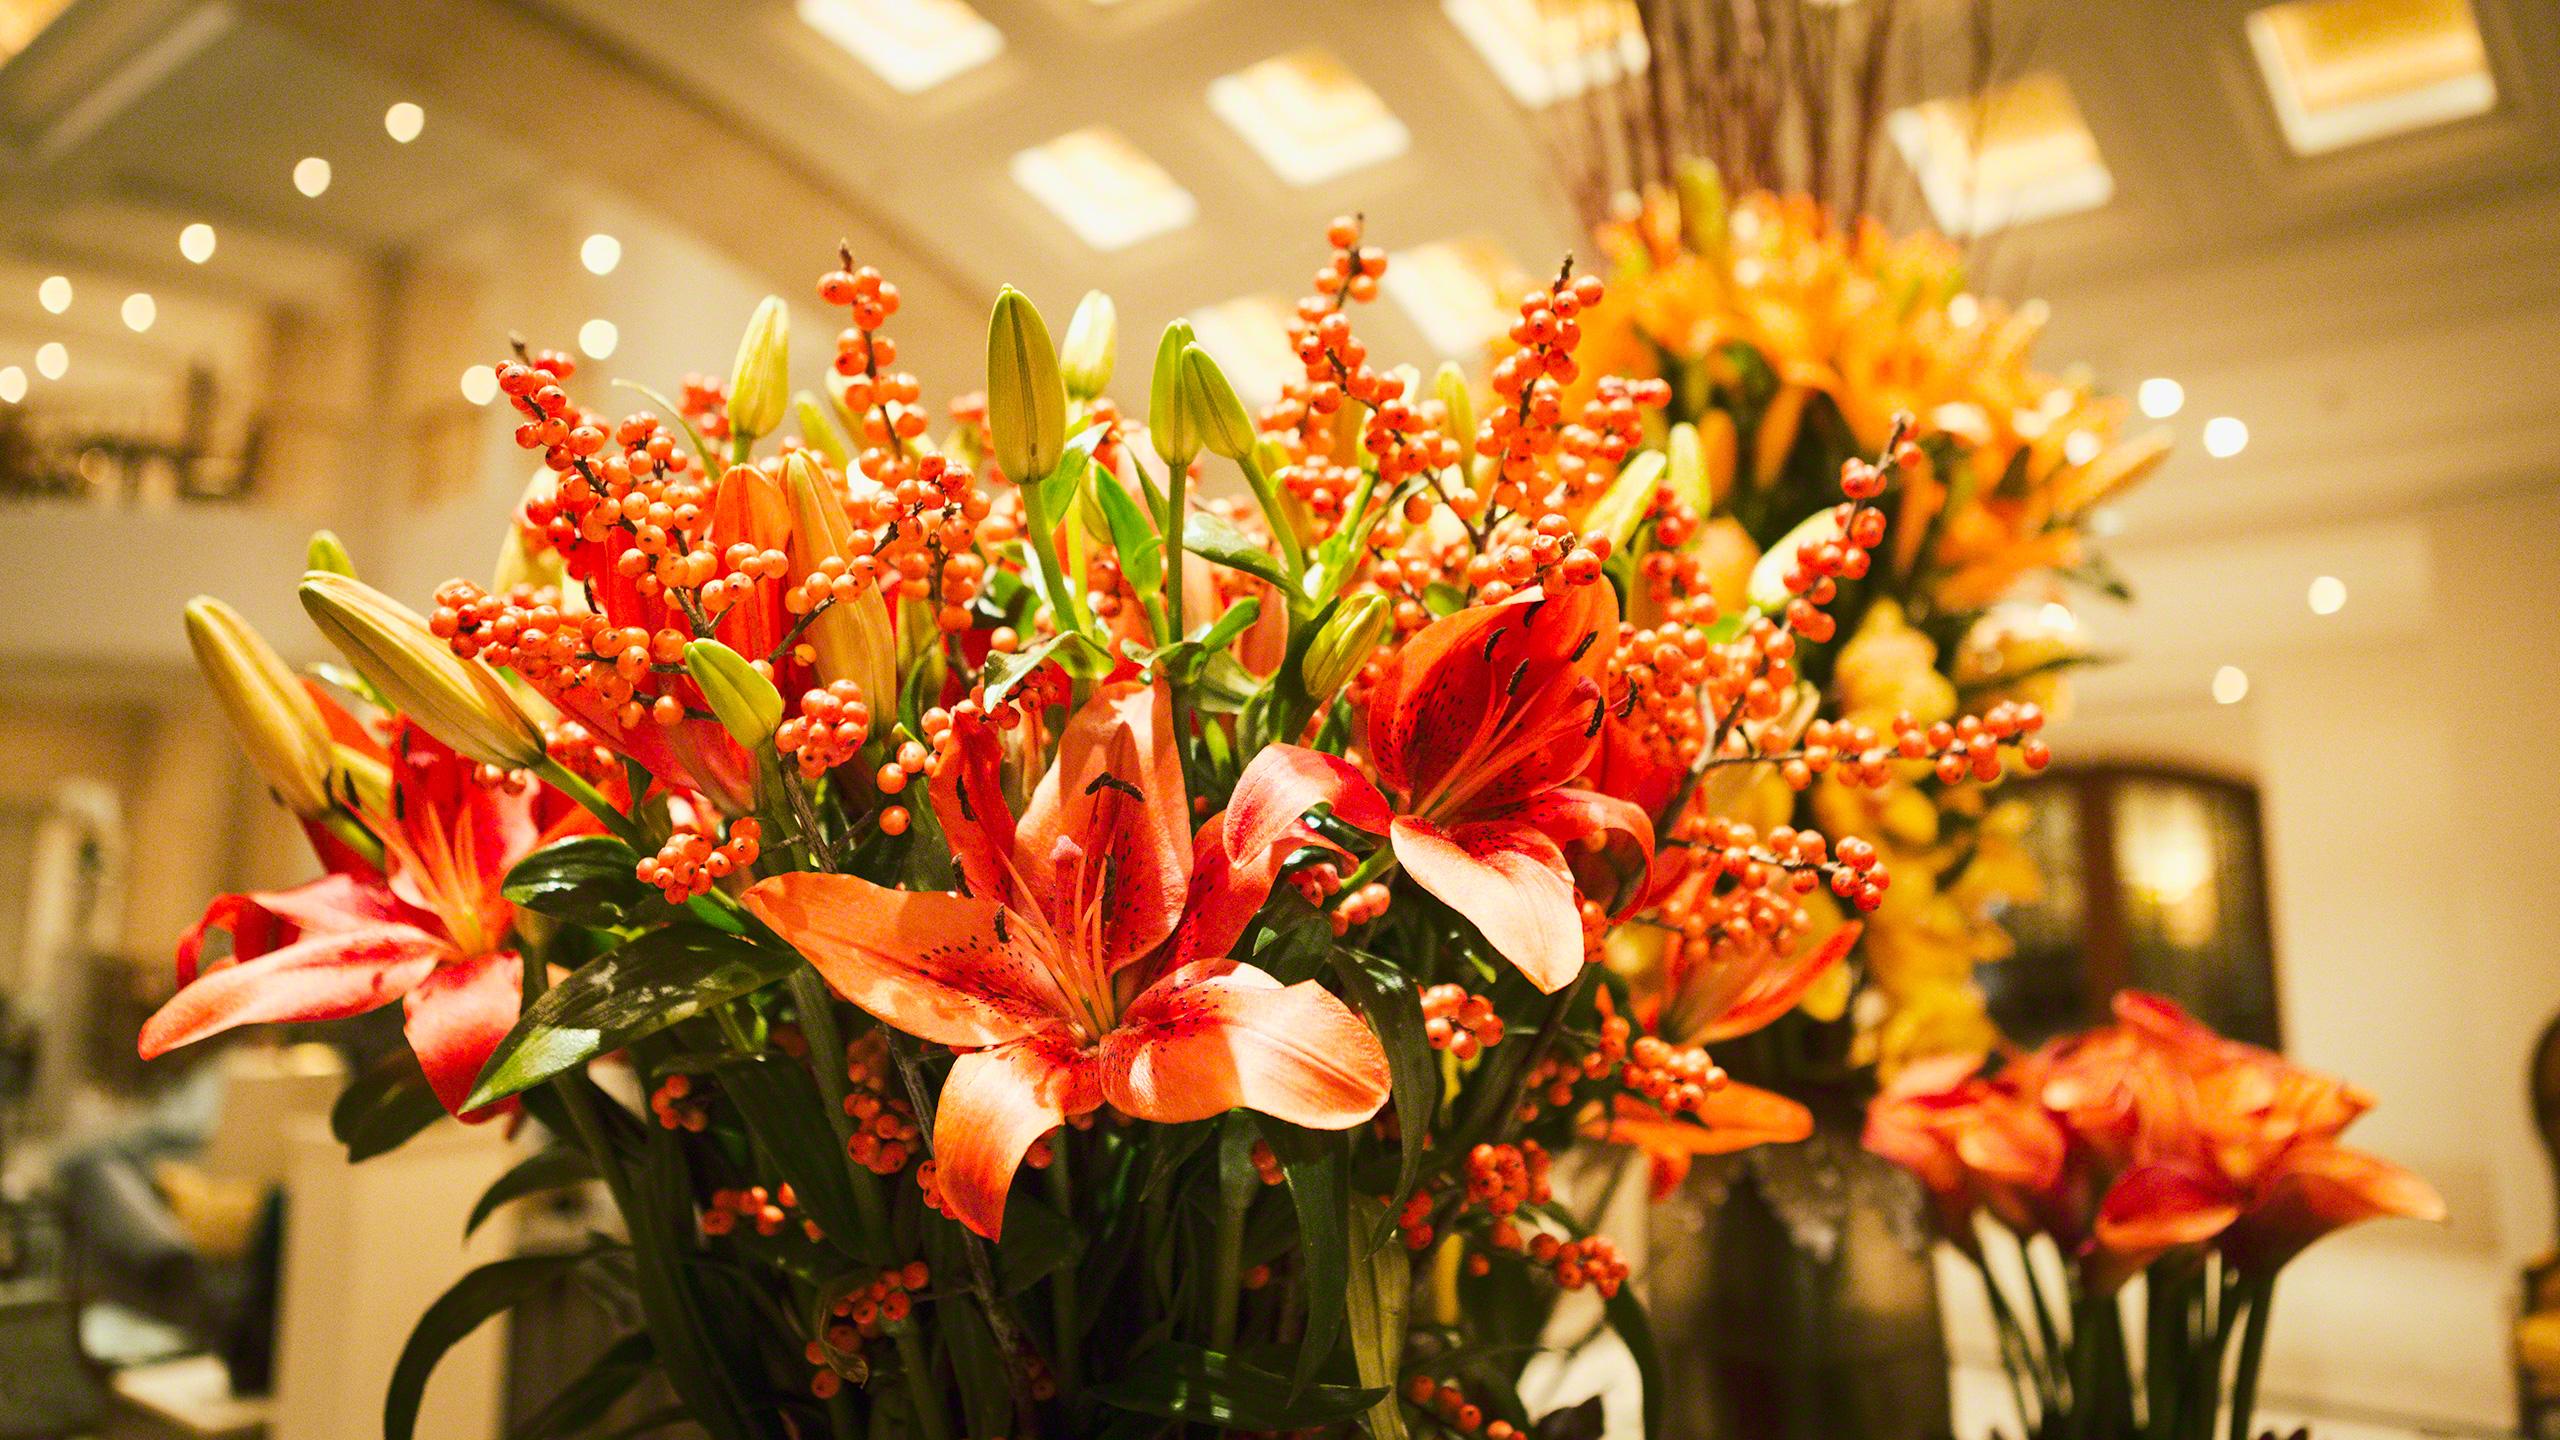 Luxushotel Adlon Kempinski Berlin Blumen